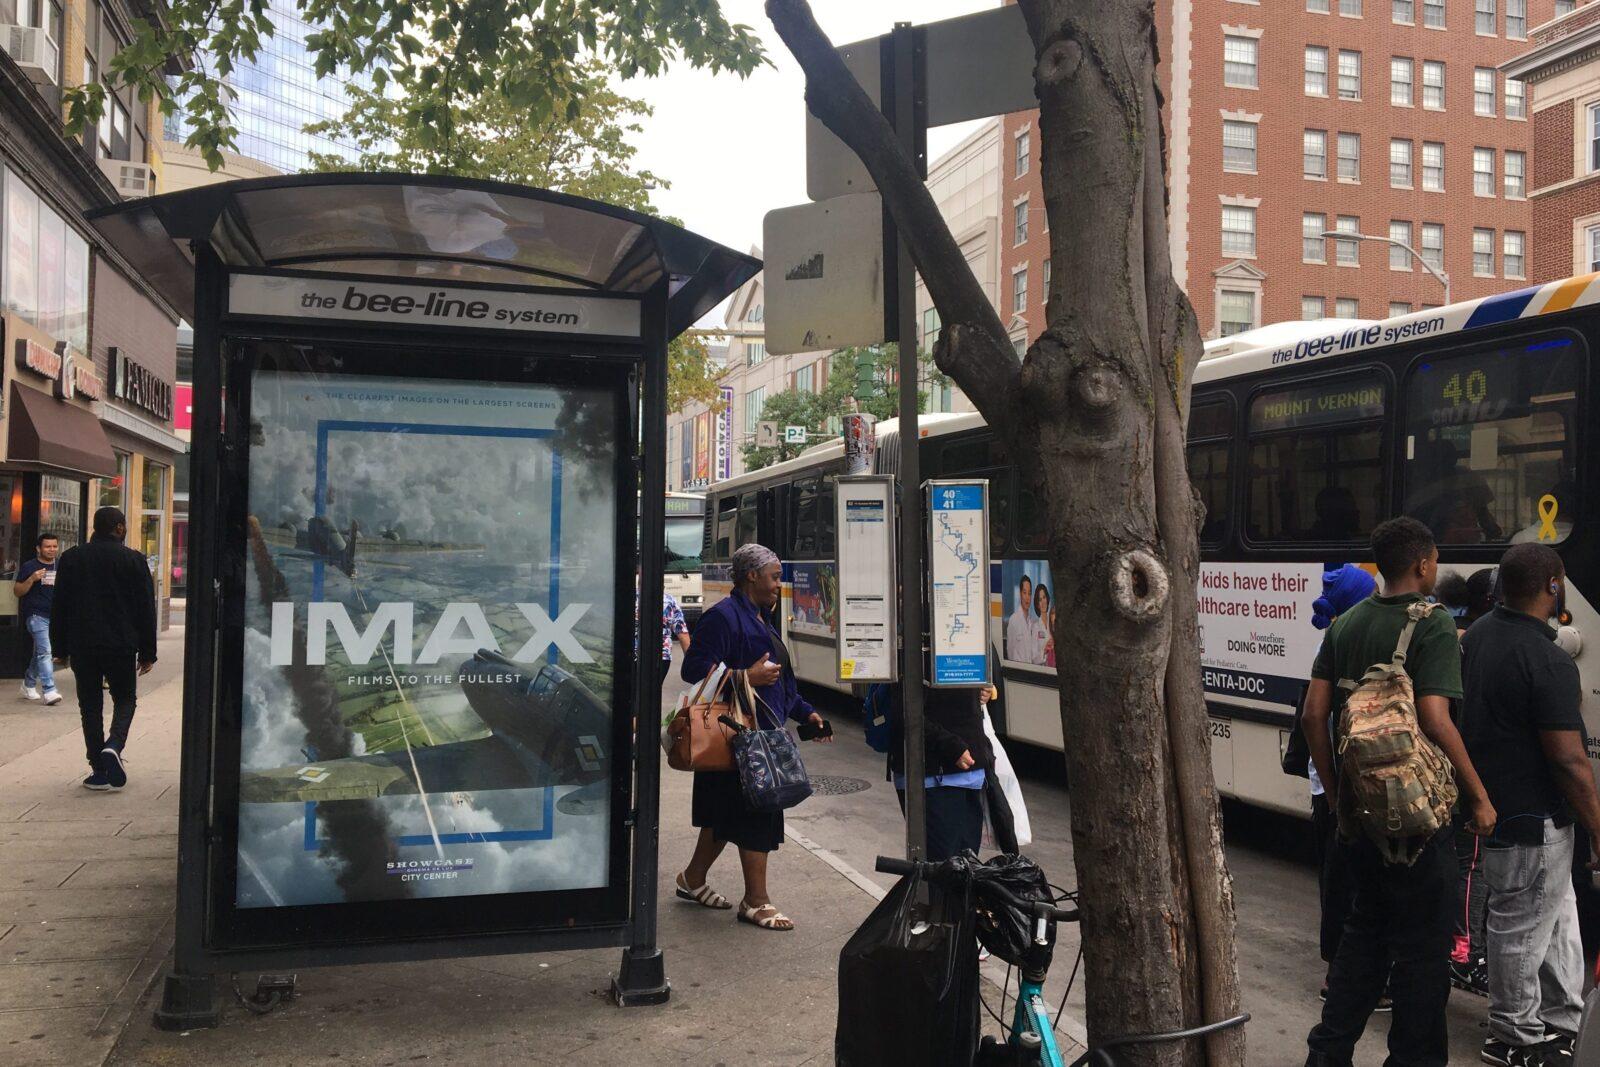 National Amusements Bus Shelter Advertising